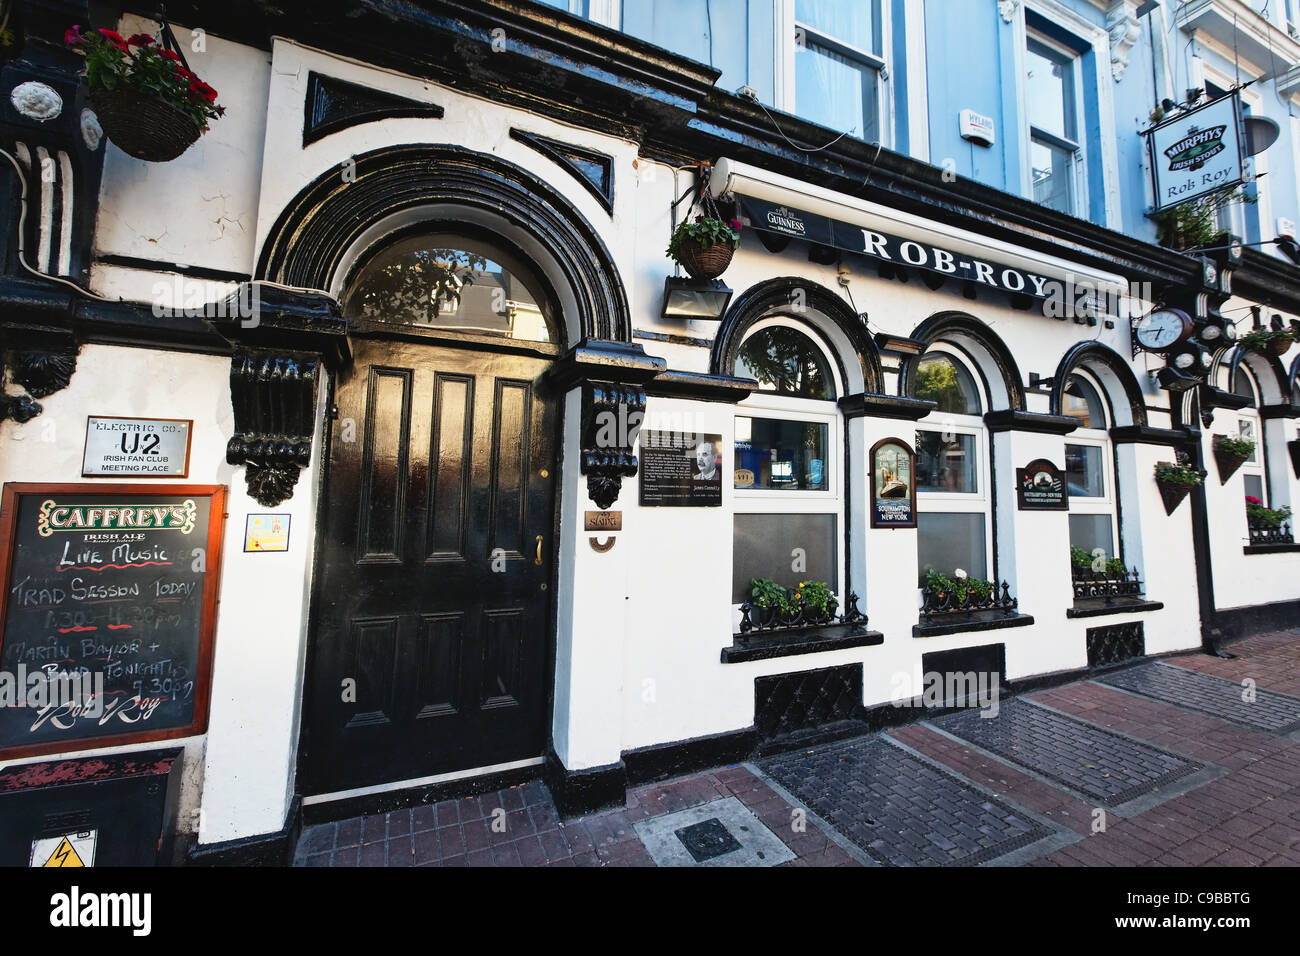 Exterior View of the Rob-Roy Pub, Cobh, County Cork, Irish Republic Stock Photo